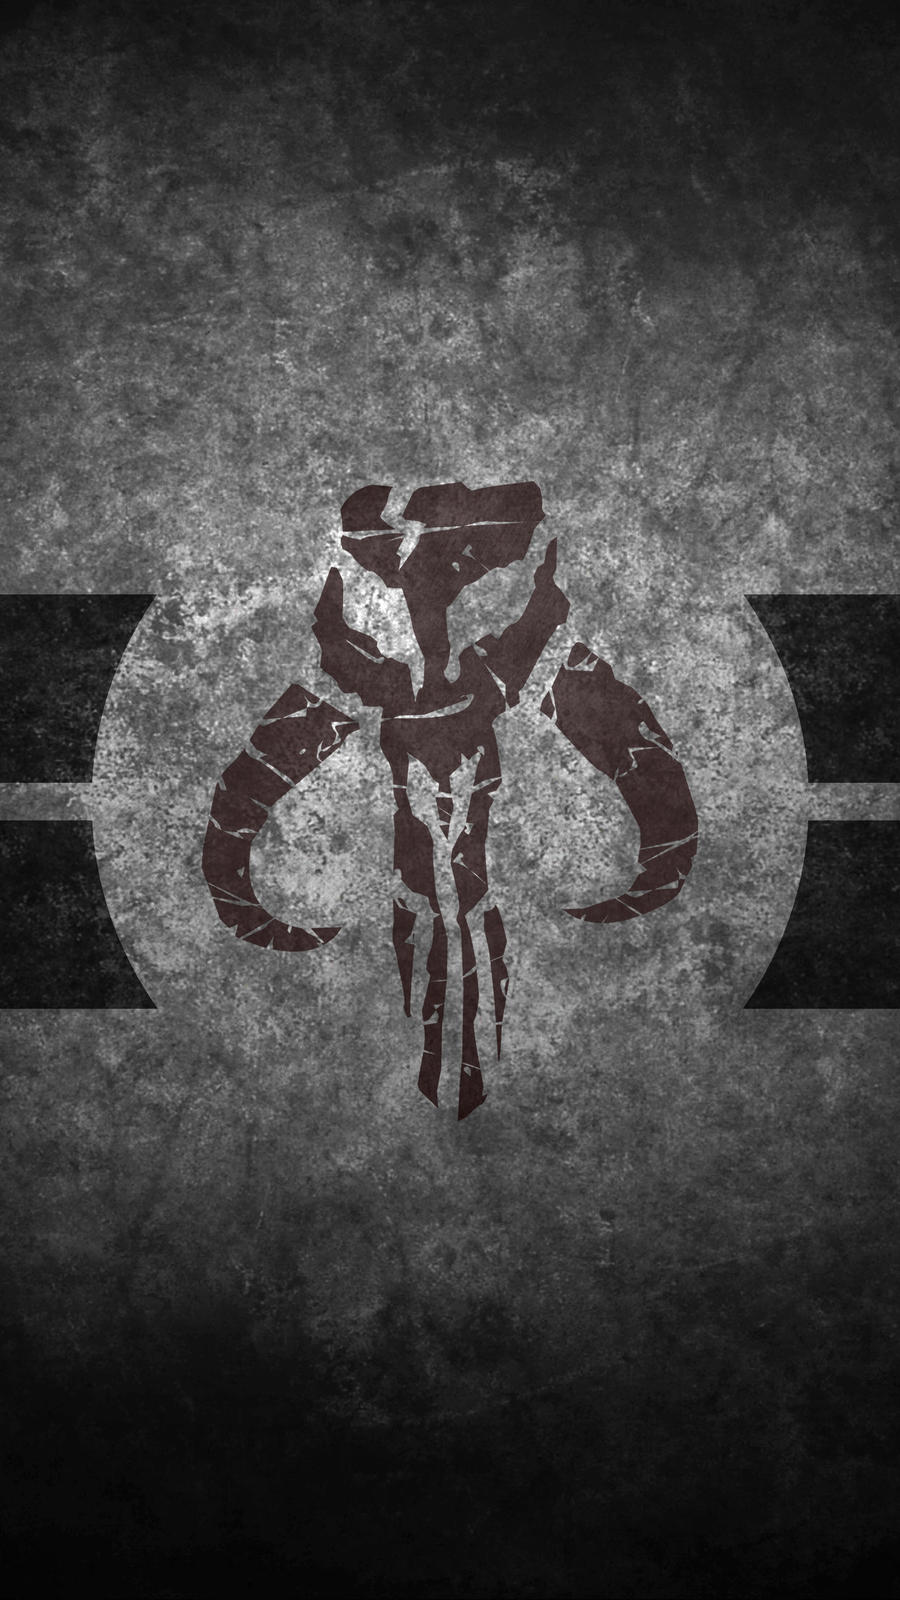 Mandalorian Skull Cellphone Wallpaper By Swmand4 On Deviantart